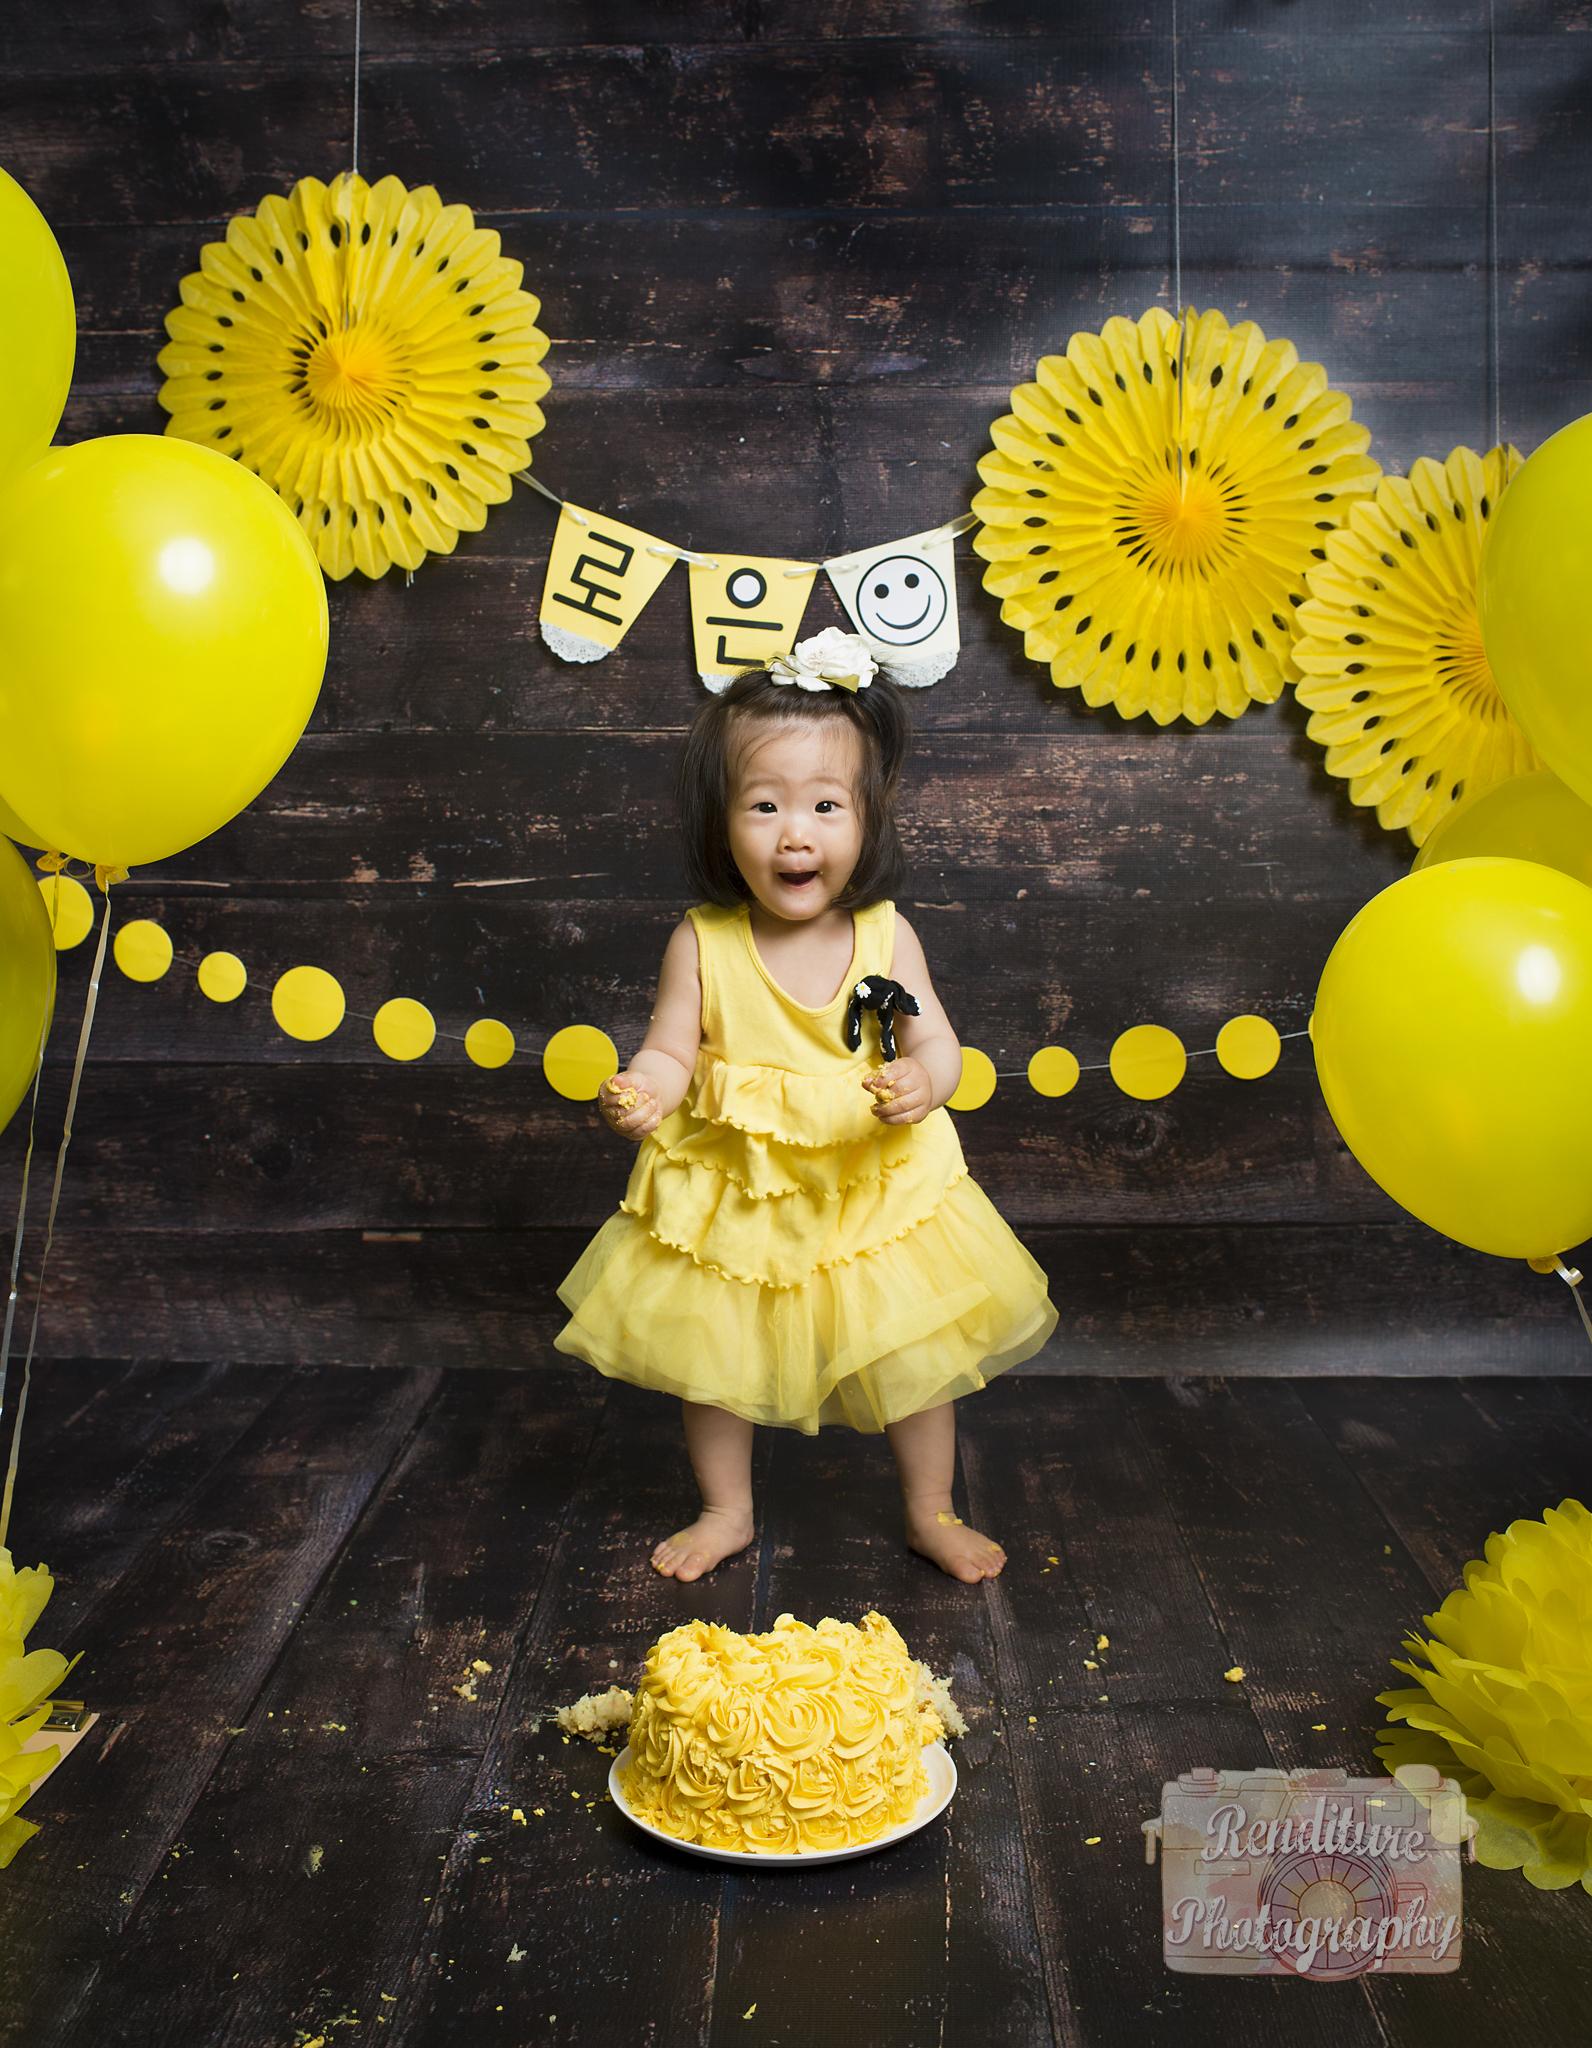 Saskatoon-Newborn-Family-Renditure-Baby-Photography-Photographer-Maternity-Pregnancy-Saskatchewan-364 FBR.jpg